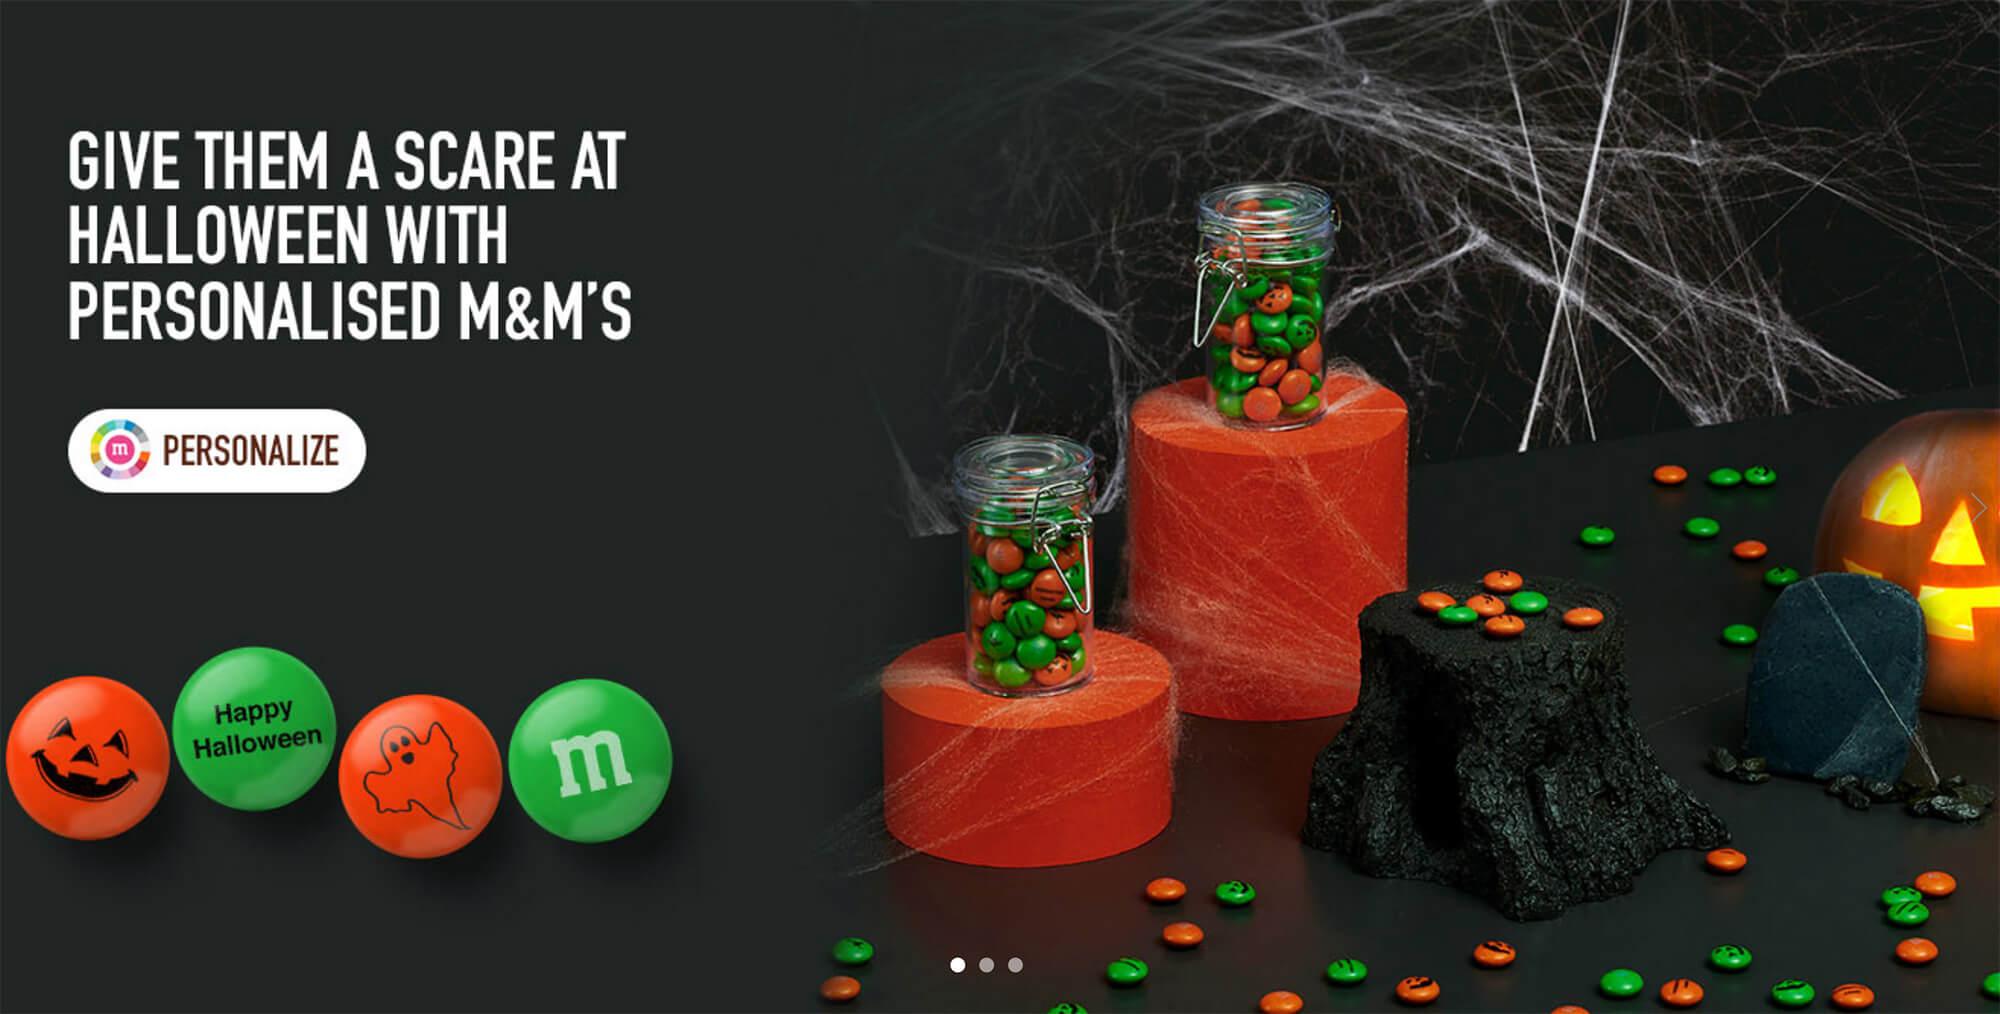 m&m-world halloween web design